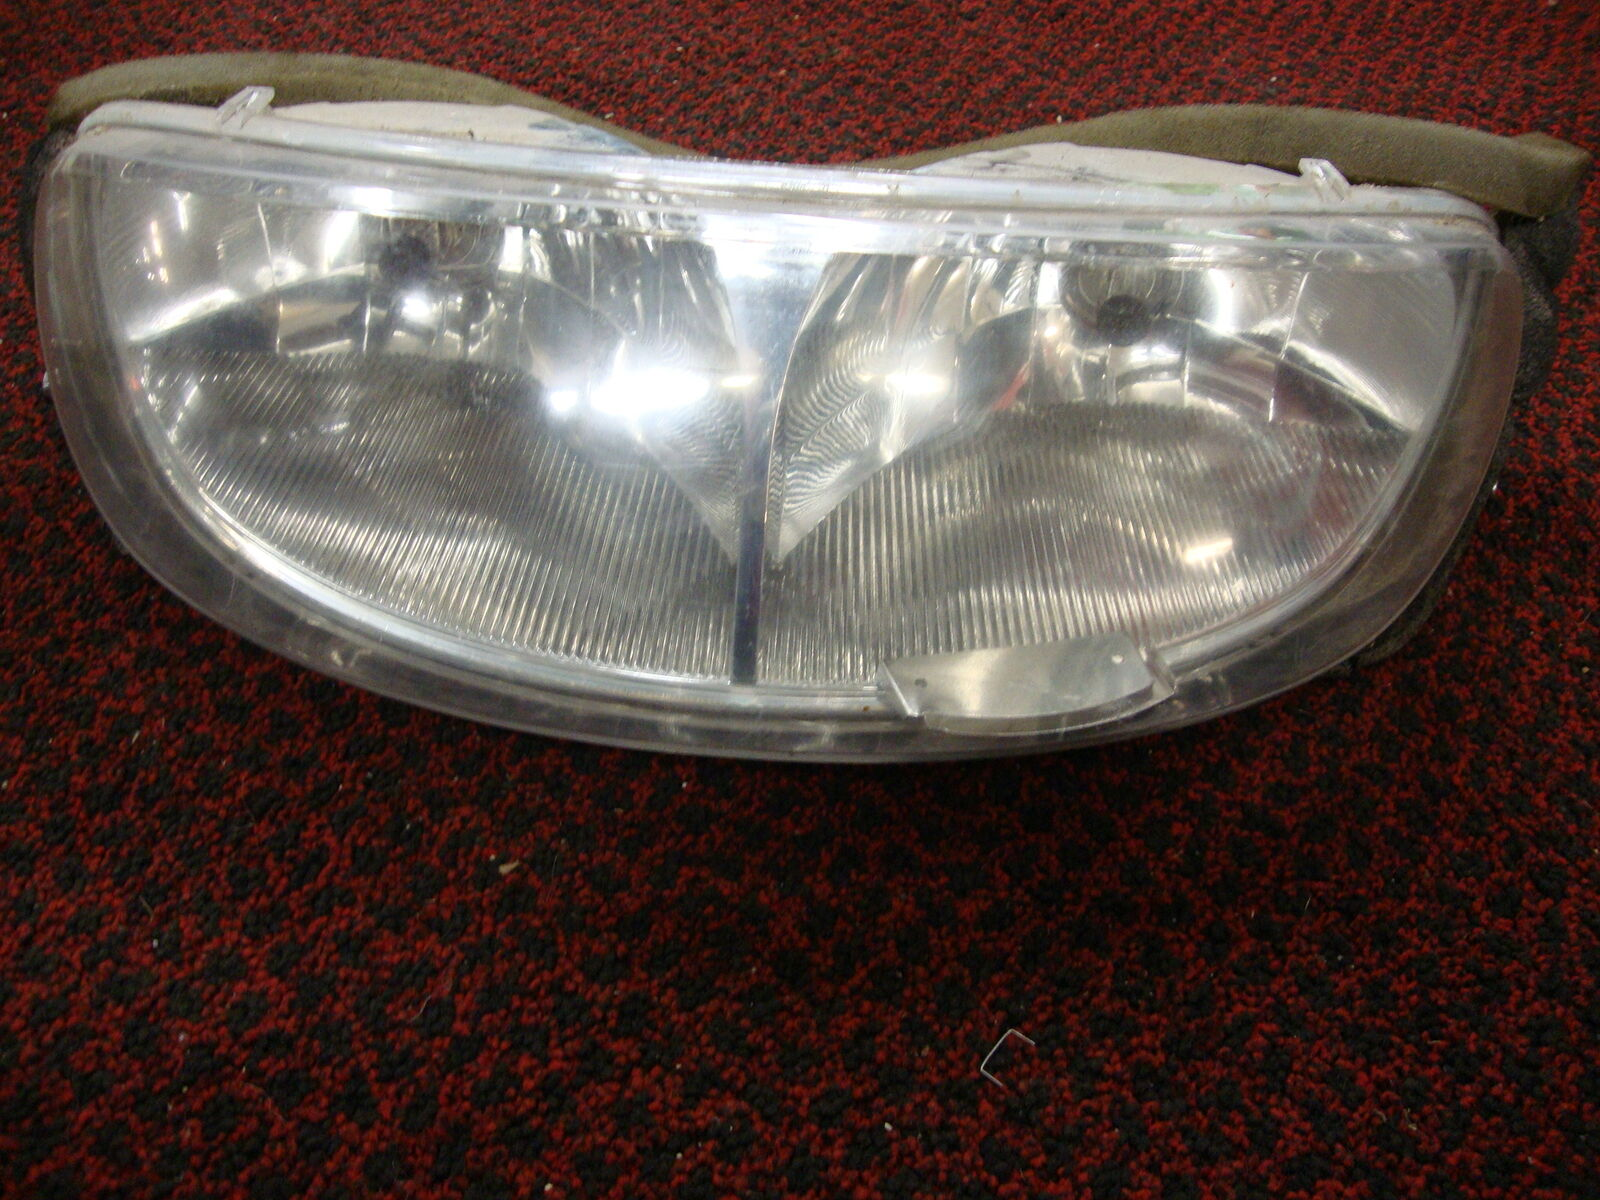 2001 Polaris Supersport 550 FRONT HEAD LIGHT LAMP HEADLIGHT 2410132